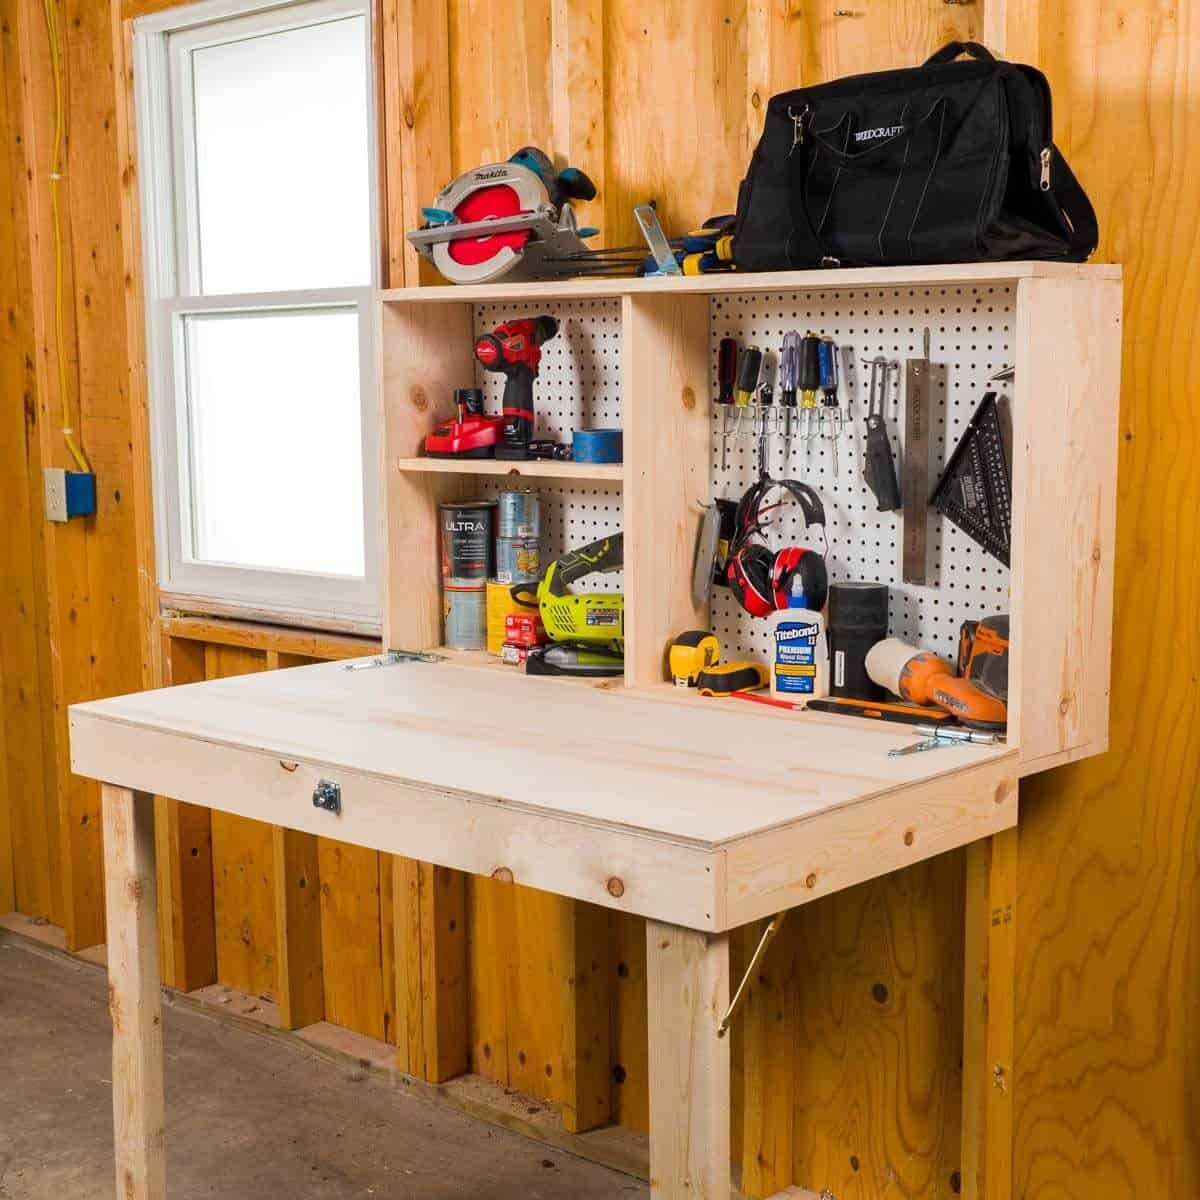 Fold Up Workbench and Storage